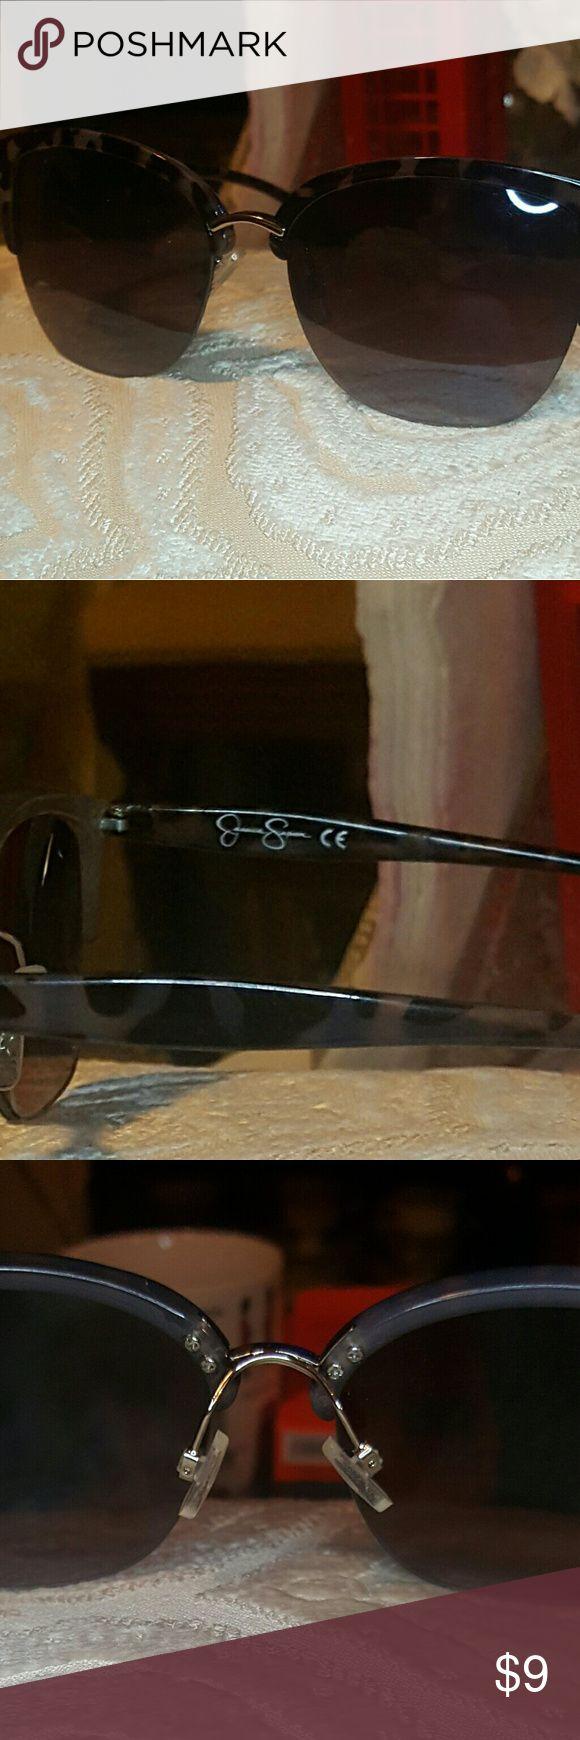 Jessica Simpson Sunglasses Grey marbled look, EUC Jessica Simpson Accessories Sunglasses